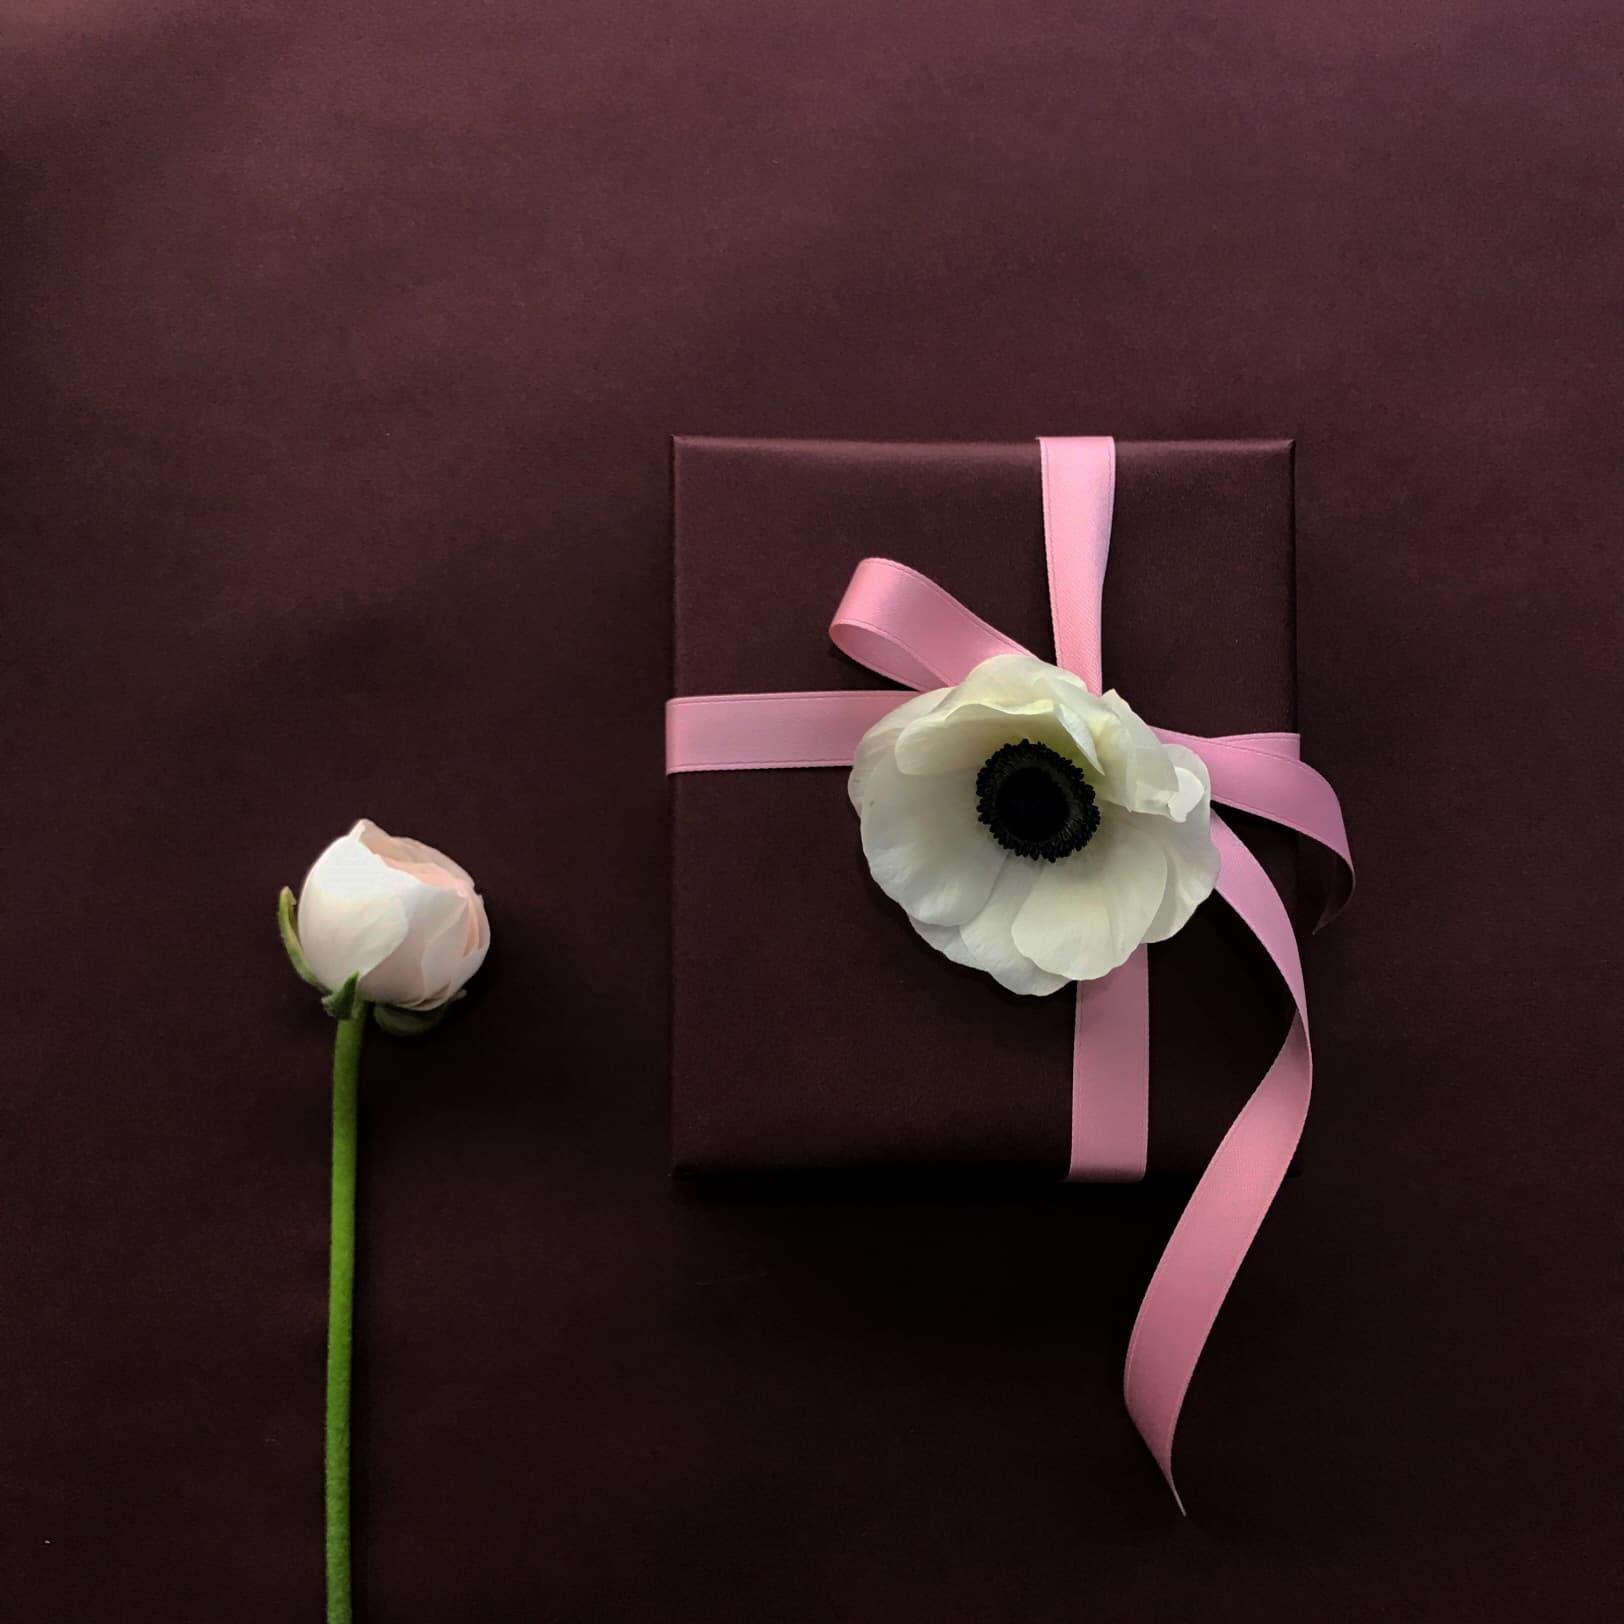 Flower Wrapping Paper Matt From Jip International Co Ltd B2b